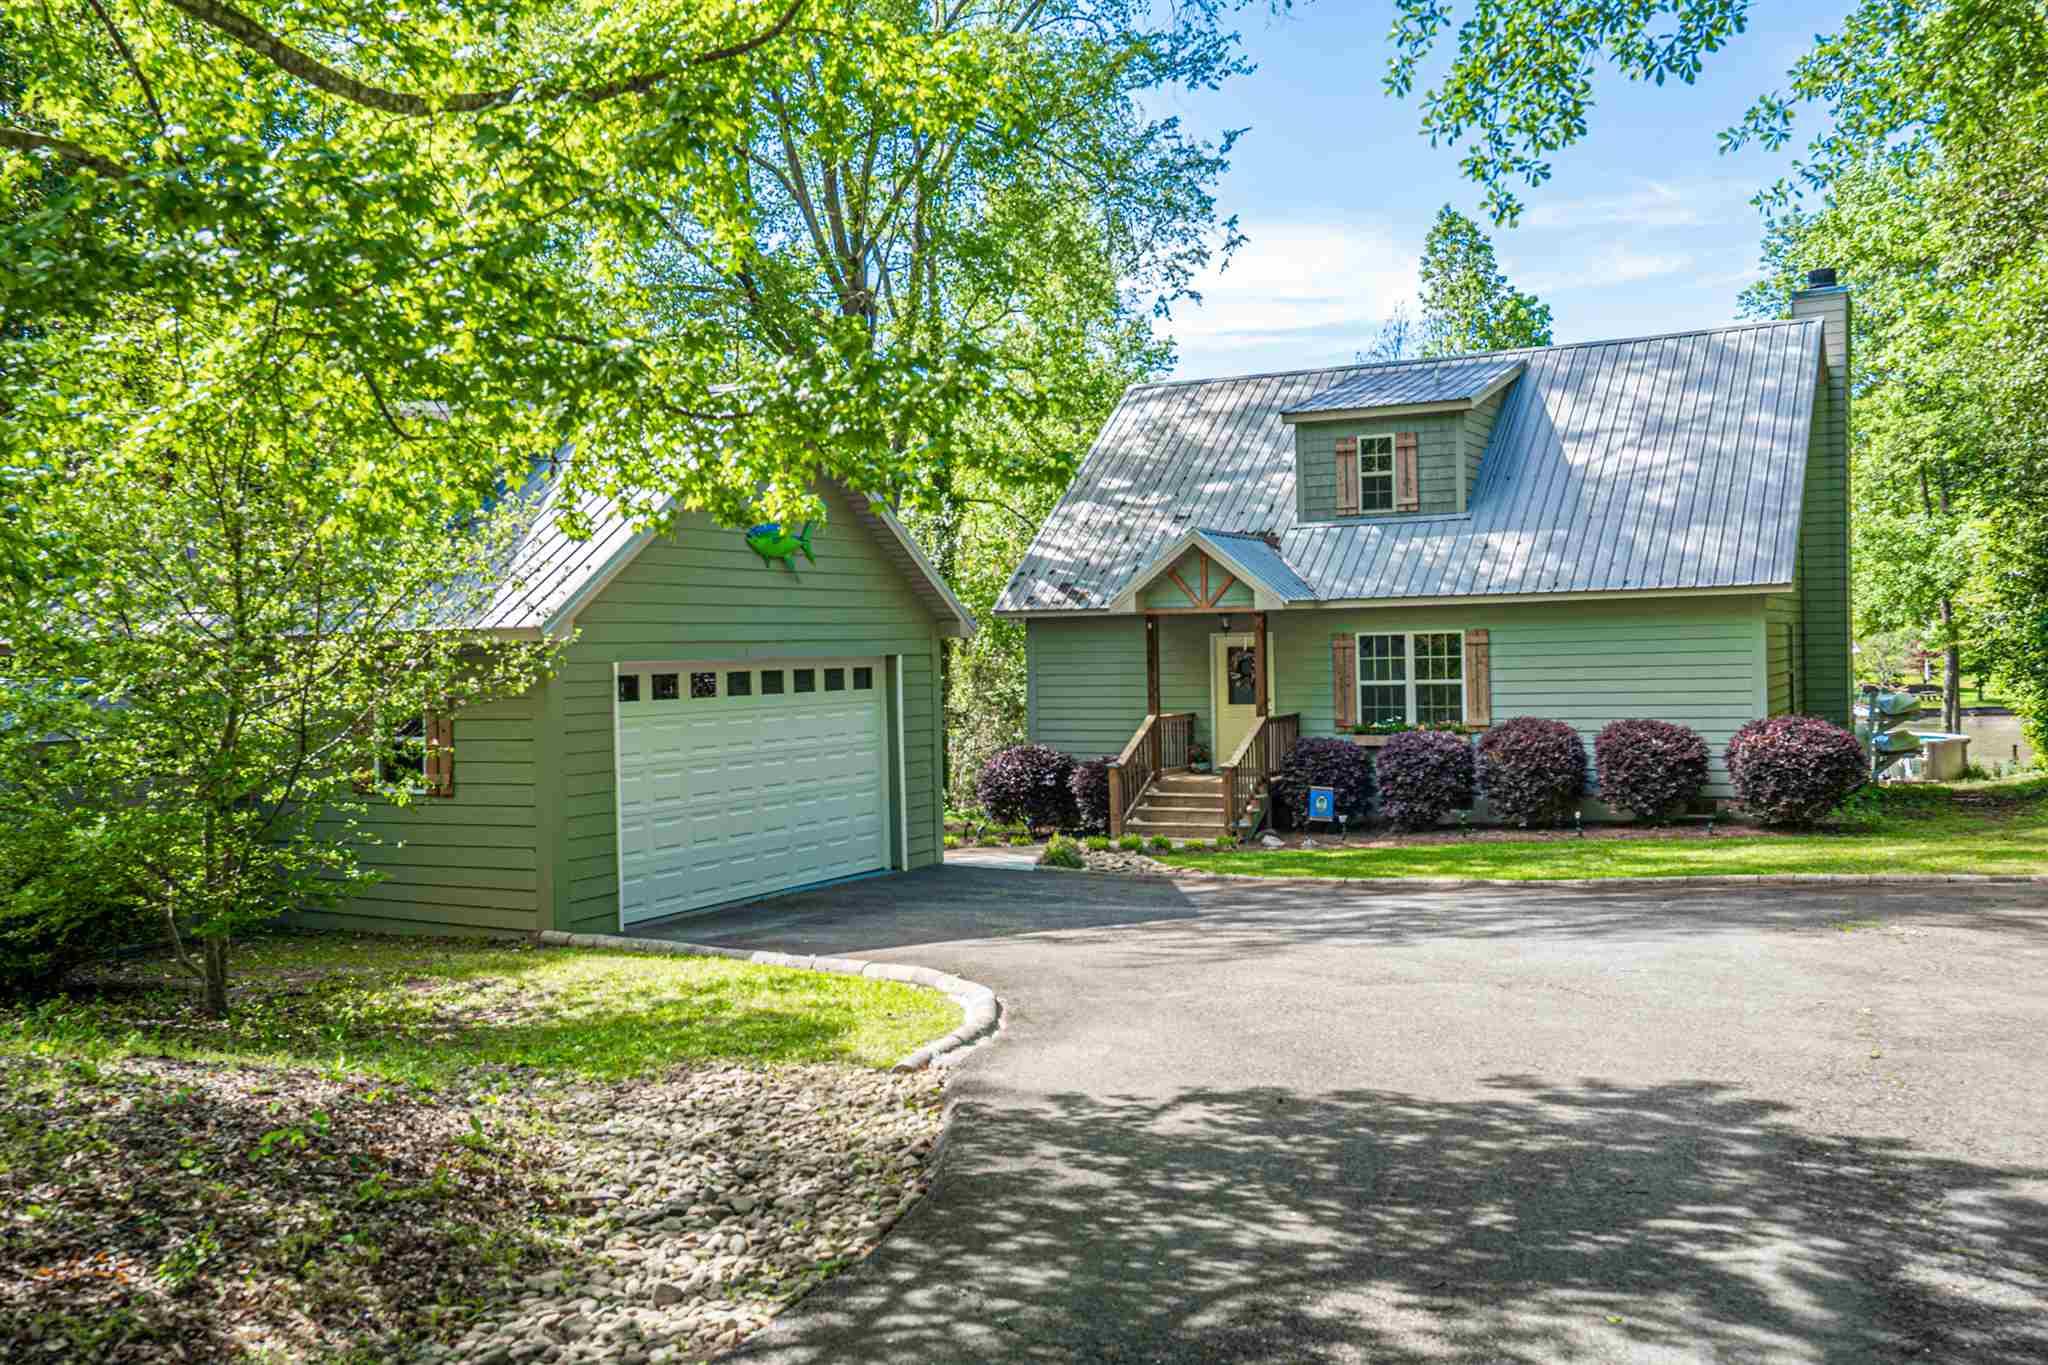 136 SANDY BEACH ROAD, Lake Sinclair in Baldwin County, GA 31081 Home for Sale